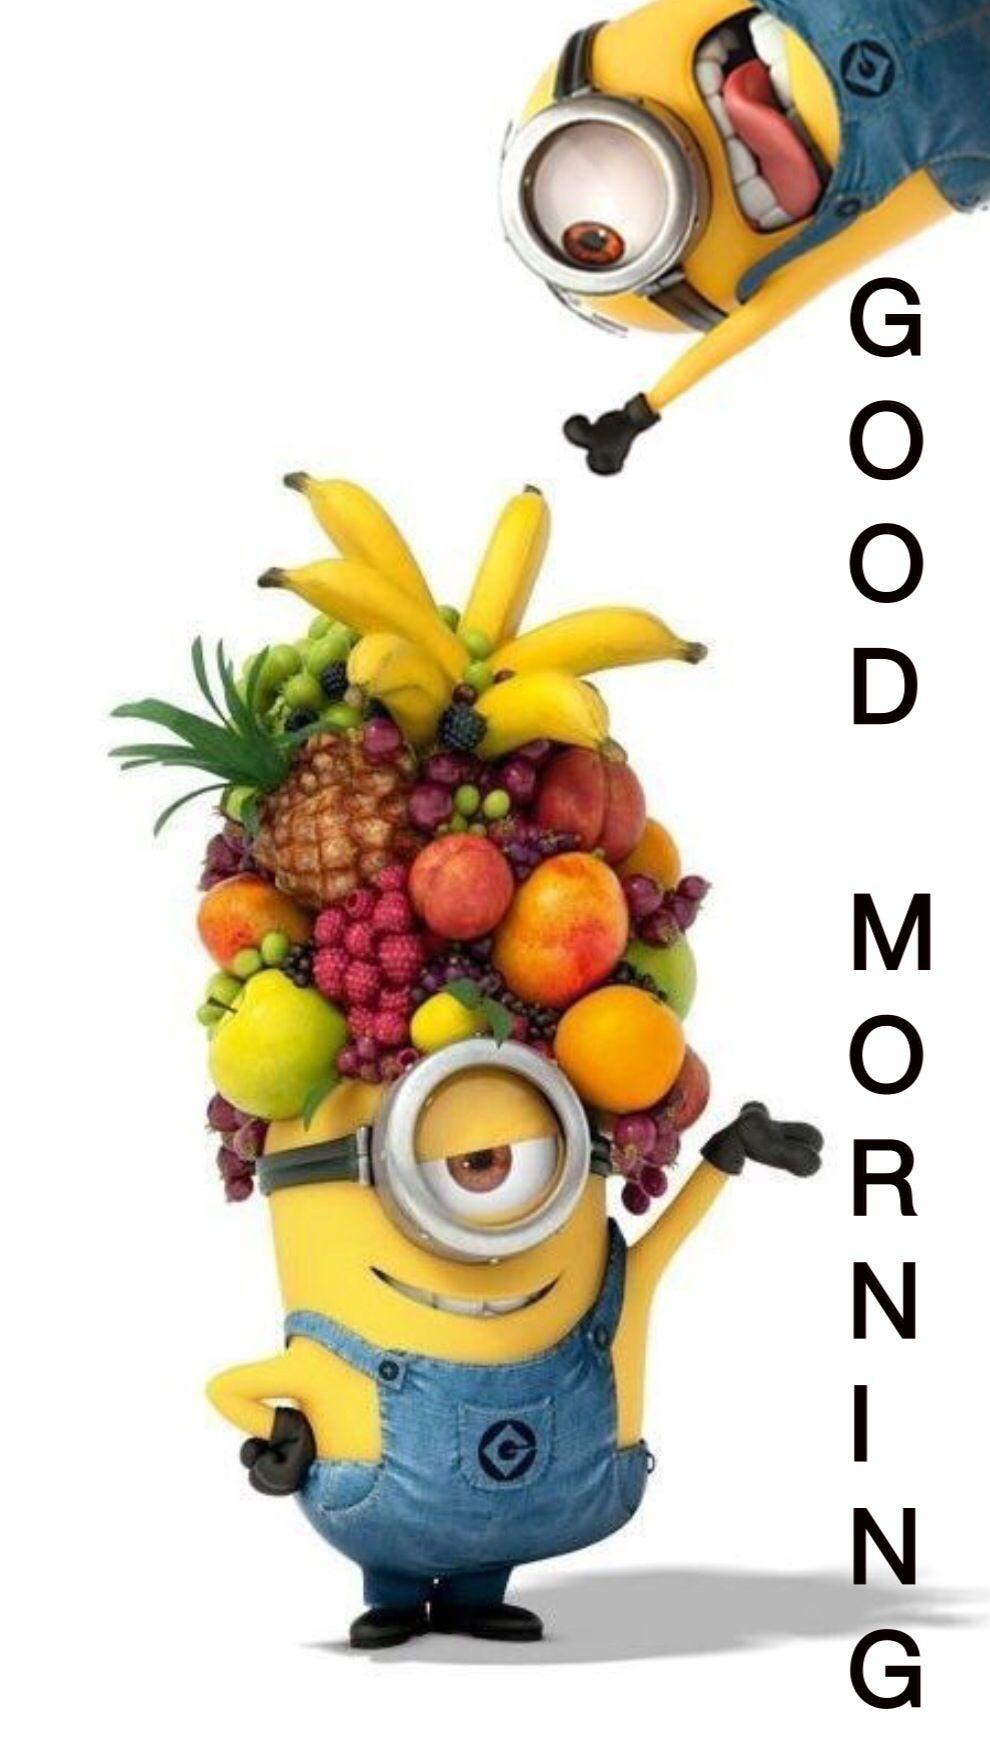 good morning good morning minions cute minions y